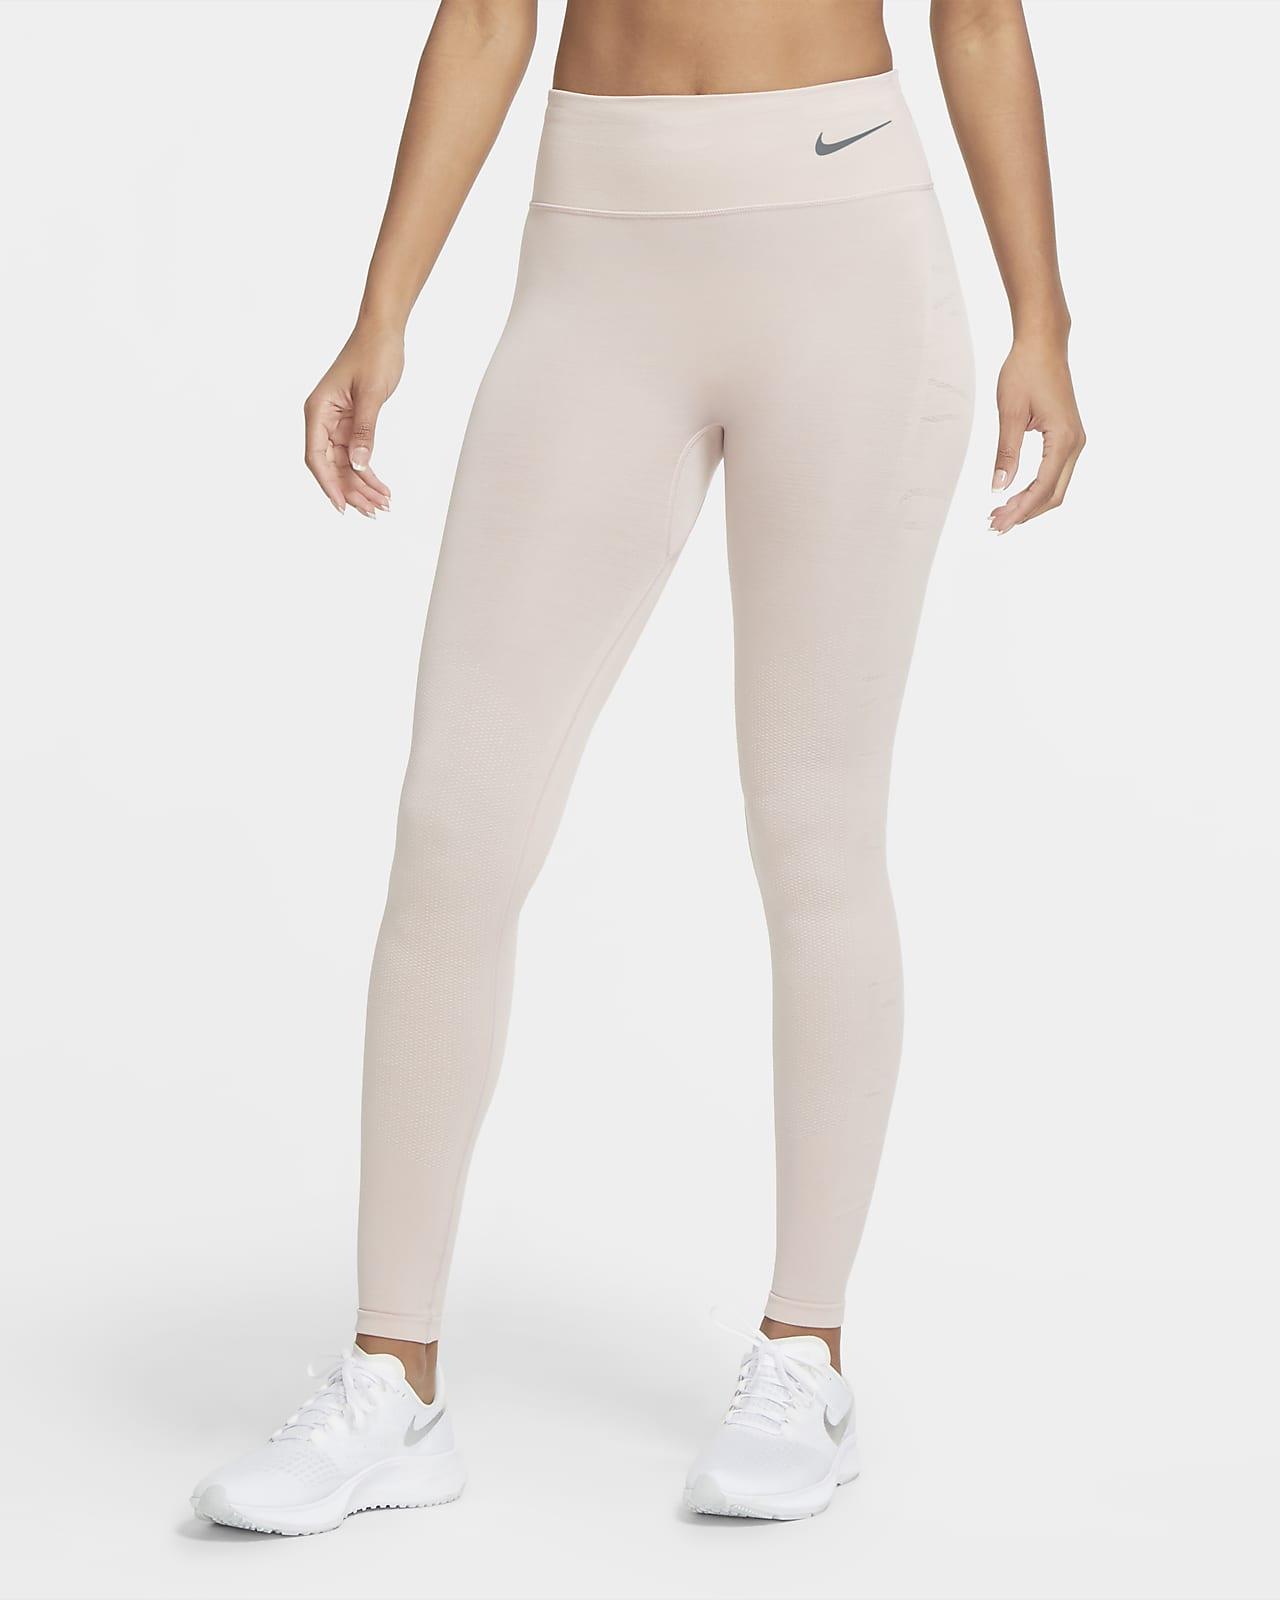 Nike Epic Luxe Run Division Women's Mid-Rise Wool Running Leggings